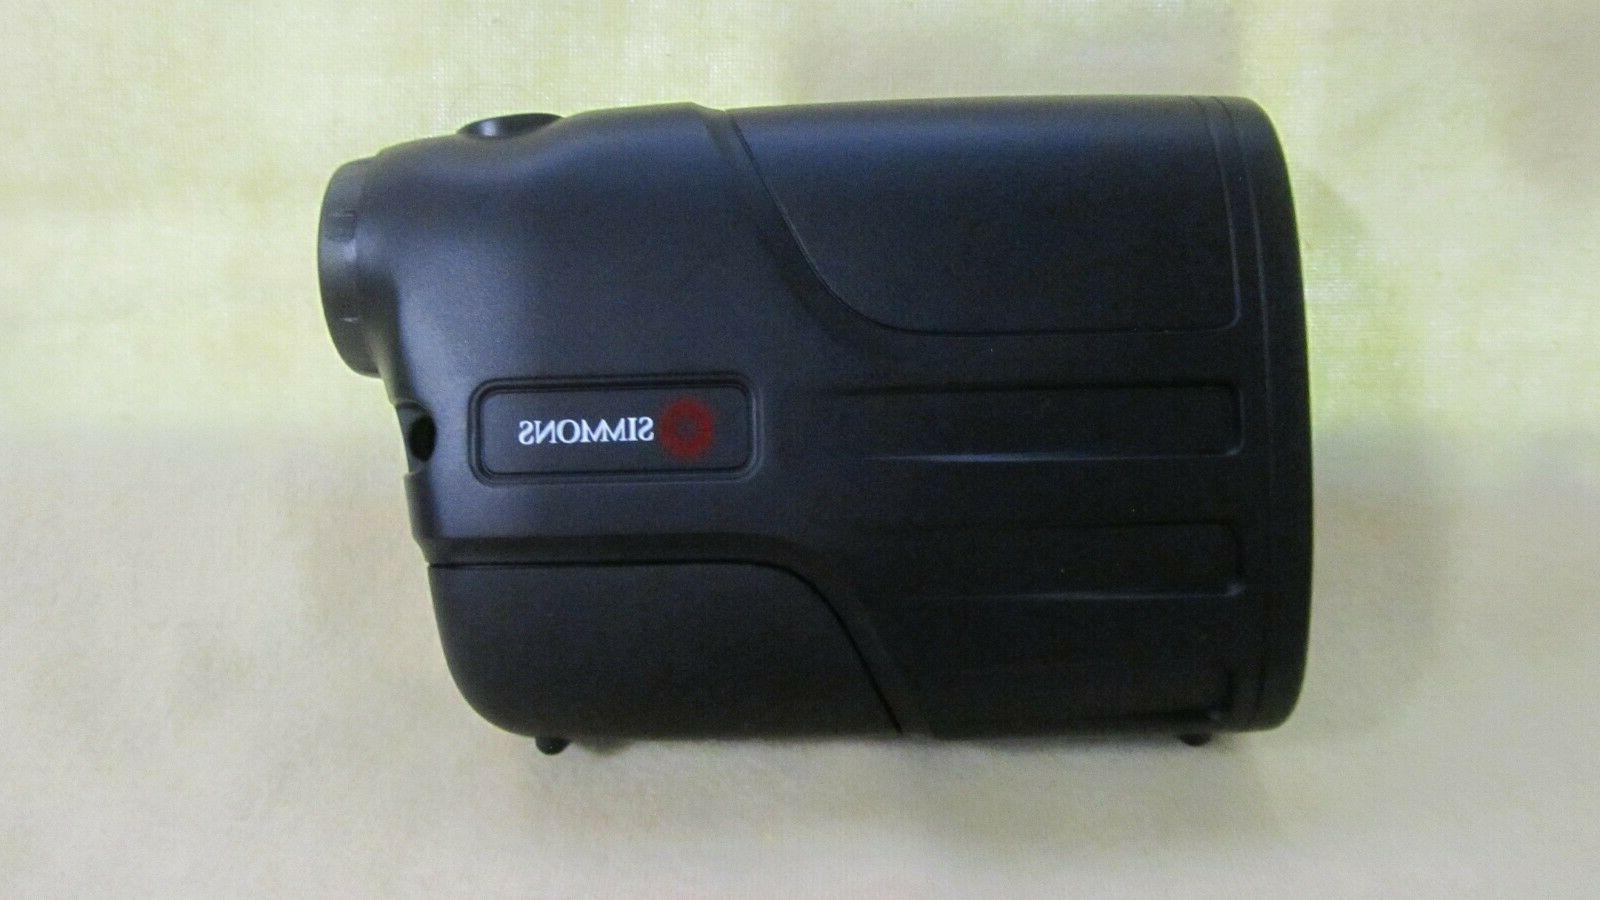 Simmons LRF 600 4x Laser Rangefinder 801405-EUC-STORE DEMO-FREE SHIPPING